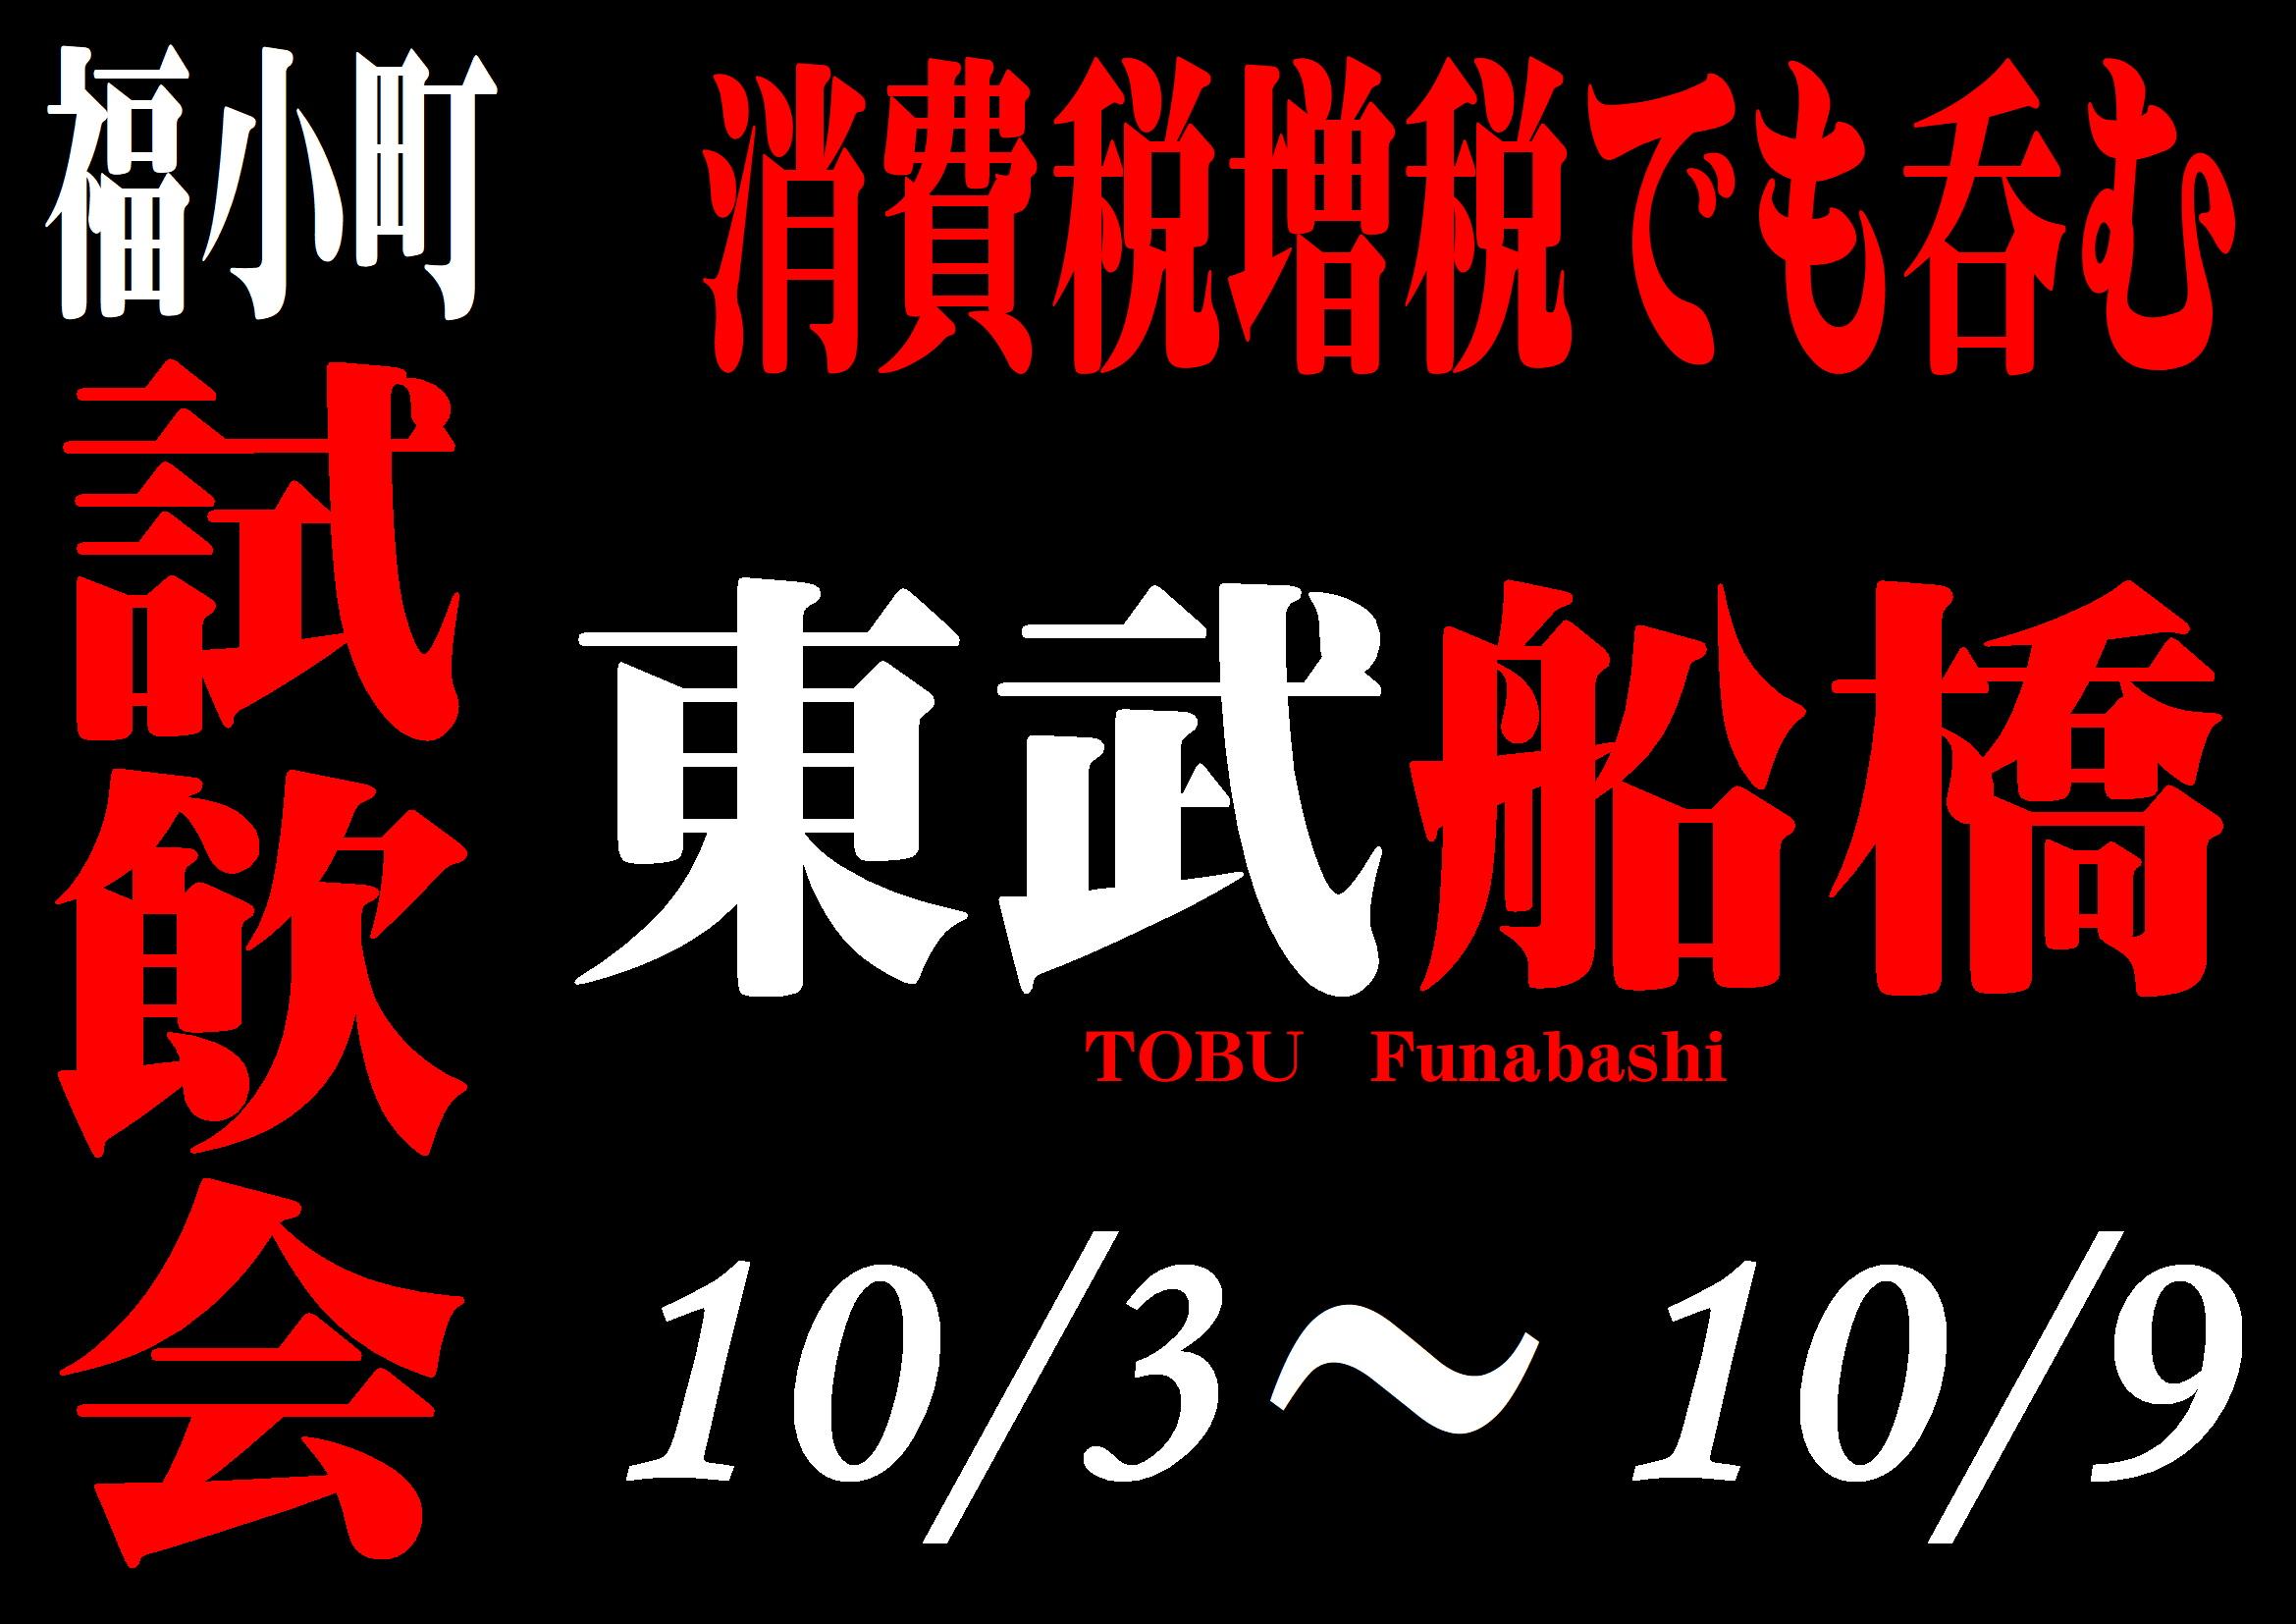 http://www.fukukomachi.com/blog/photo/20191003.JPG